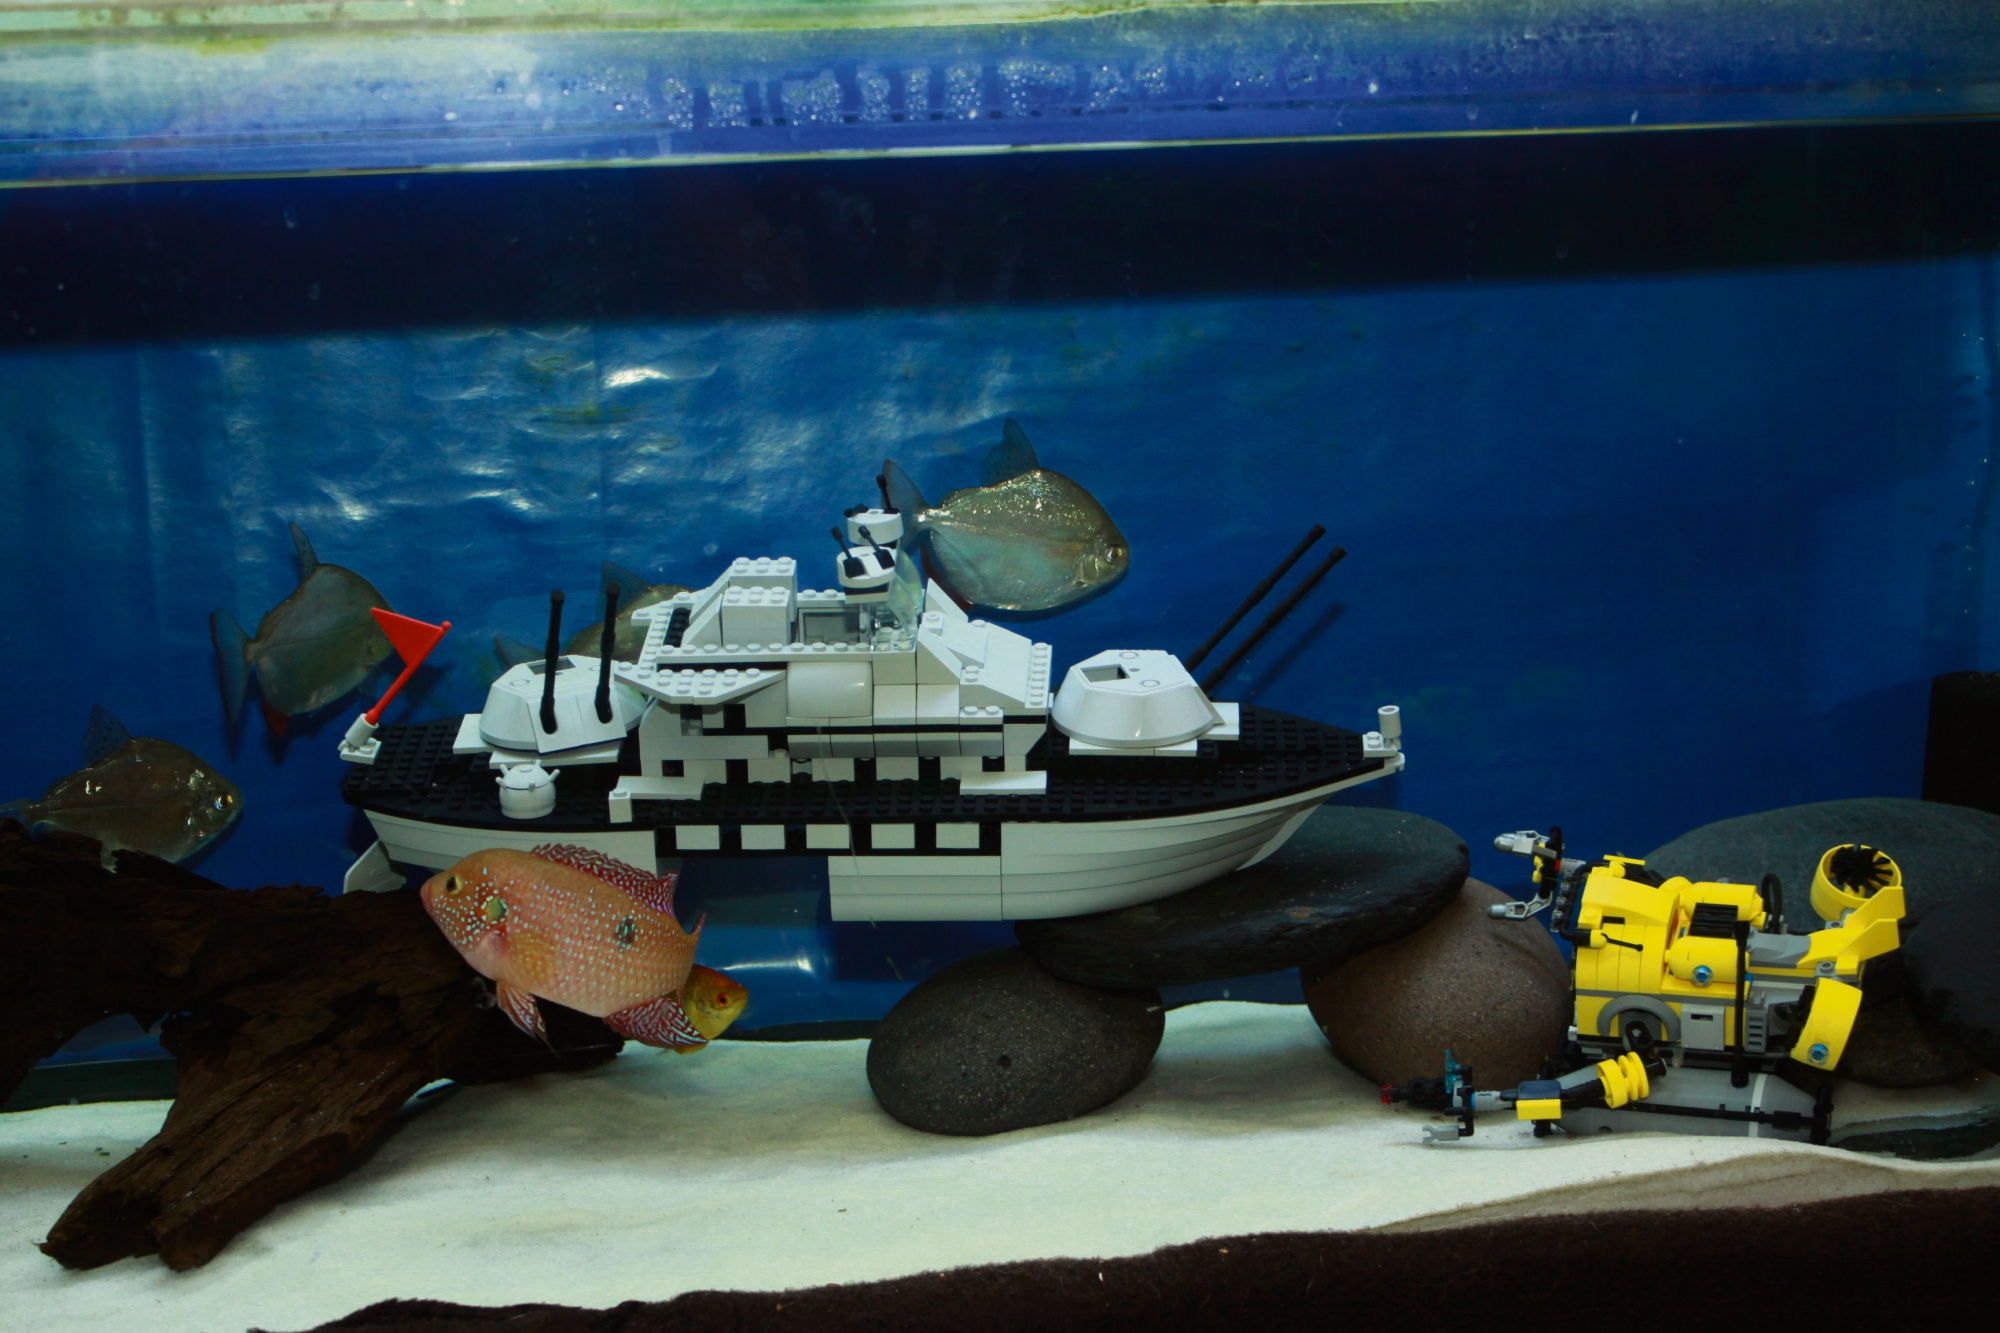 Baldivis 'Lego sensei' building on success